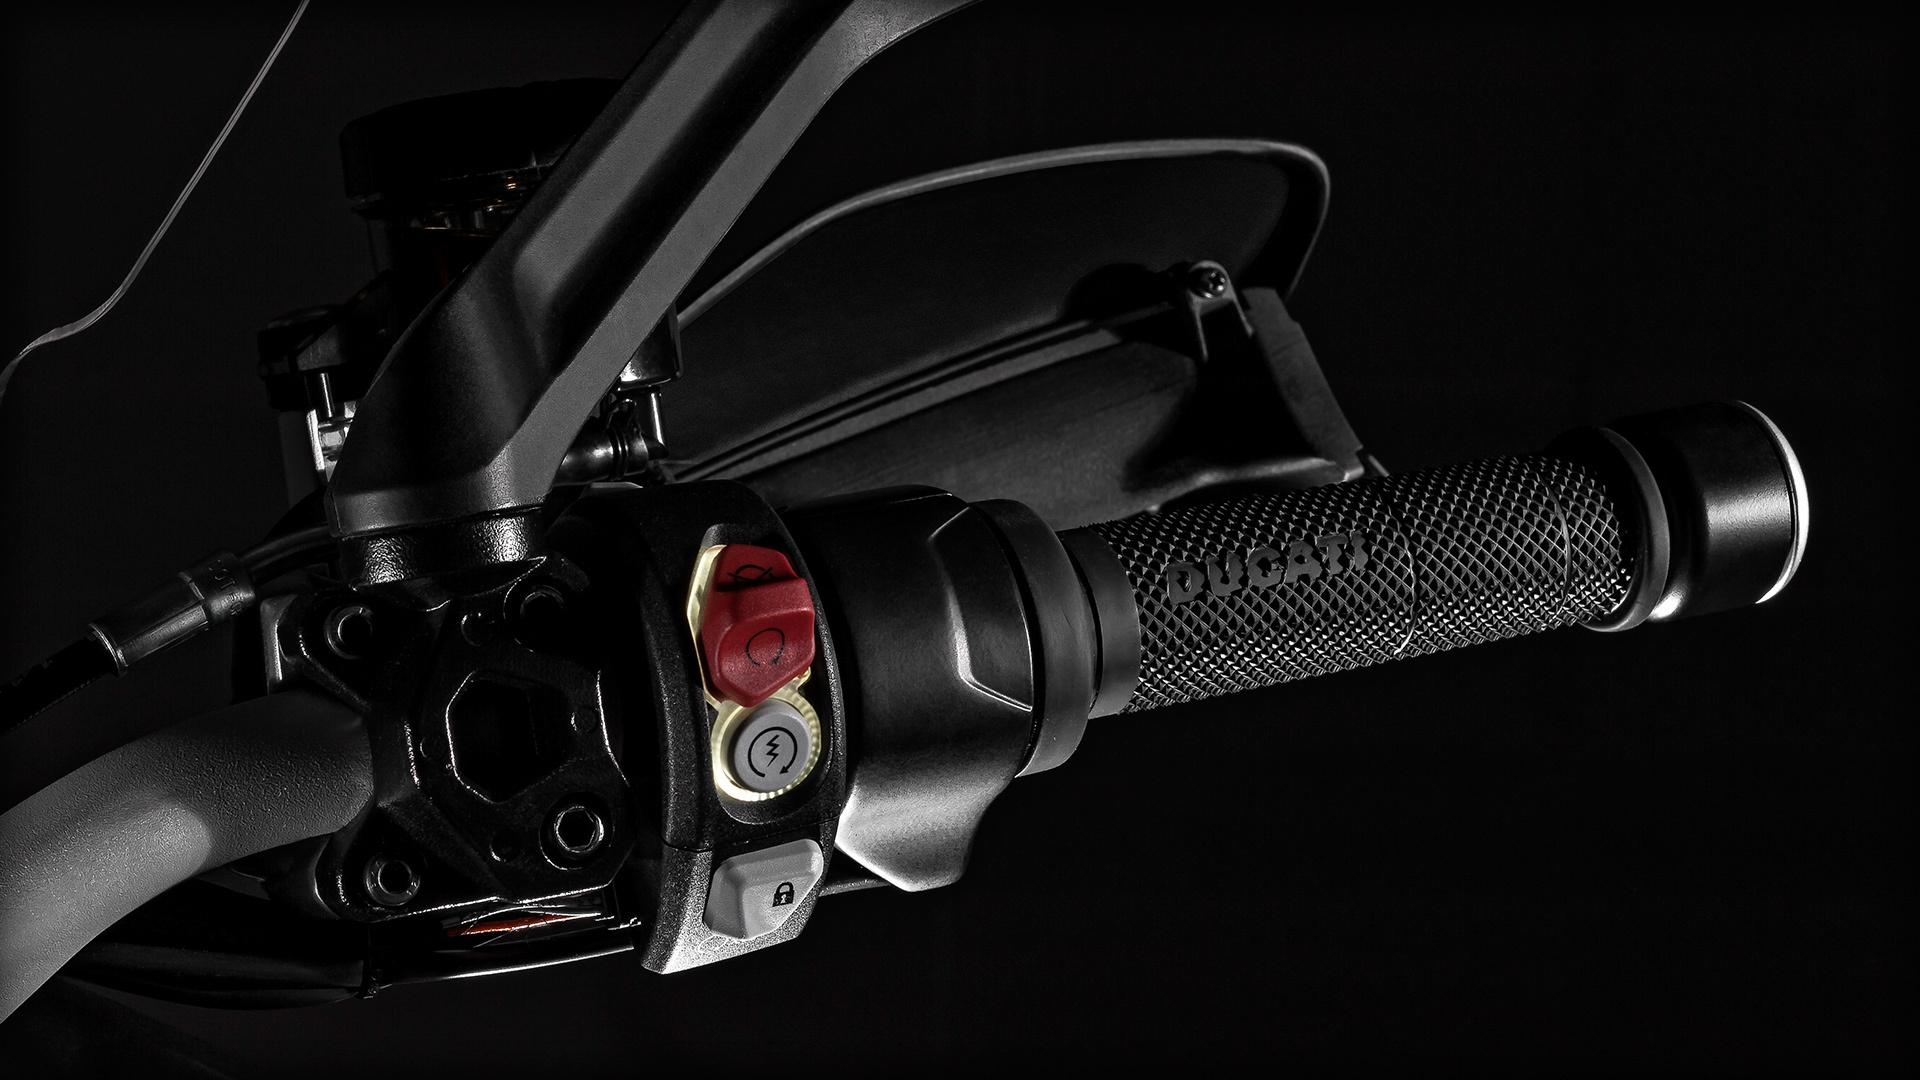 МОТОЦИКЛ DUCATI MULTISTRADA 1200 S ― Артмото - купить квадроцикл в украине и харькове, мотоцикл, снегоход, скутер, мопед, электромобиль